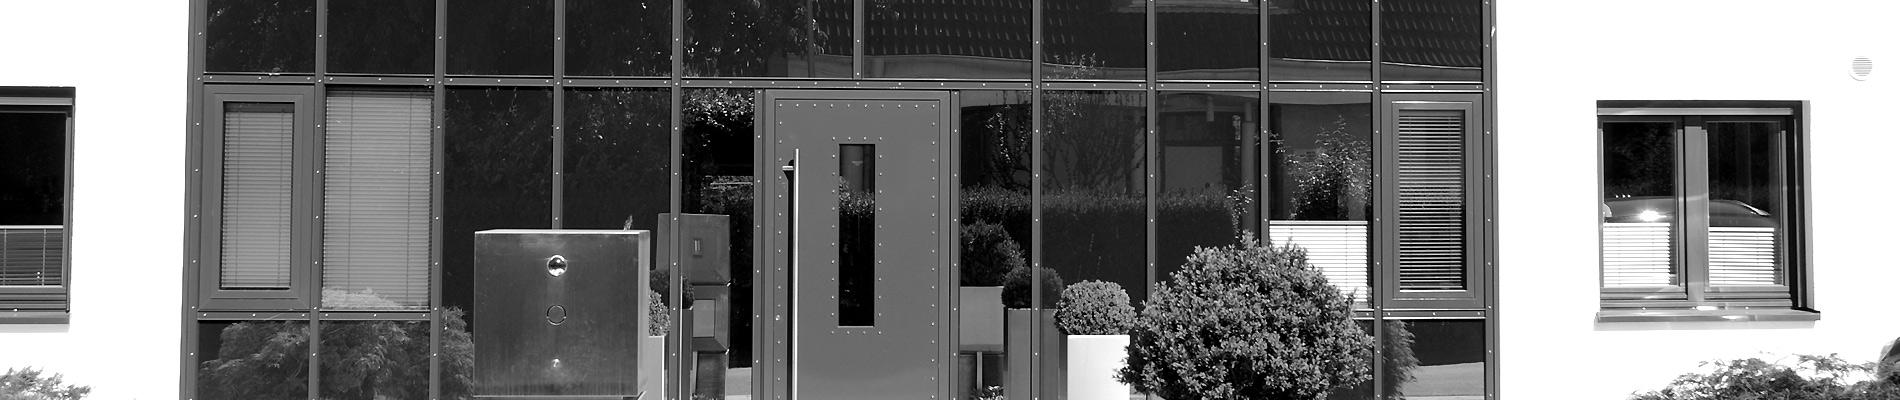 Metallbau Besemann | Stahlbau Ascheberg-Herbern - Haustüren